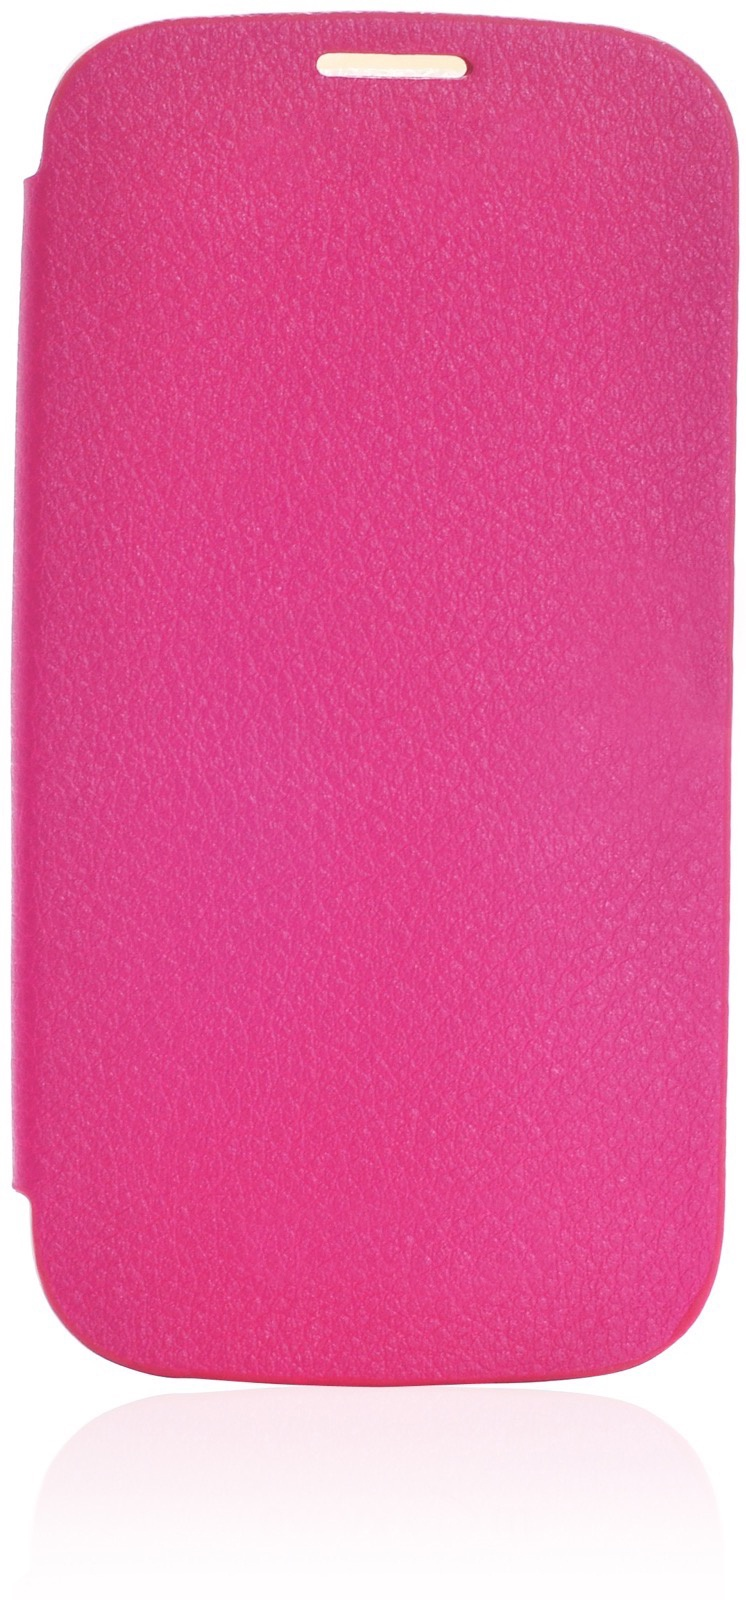 Чехол Gurdini Flip Cover Shell кожа 380065 для Samsung Galaxy S3,380065, розовый